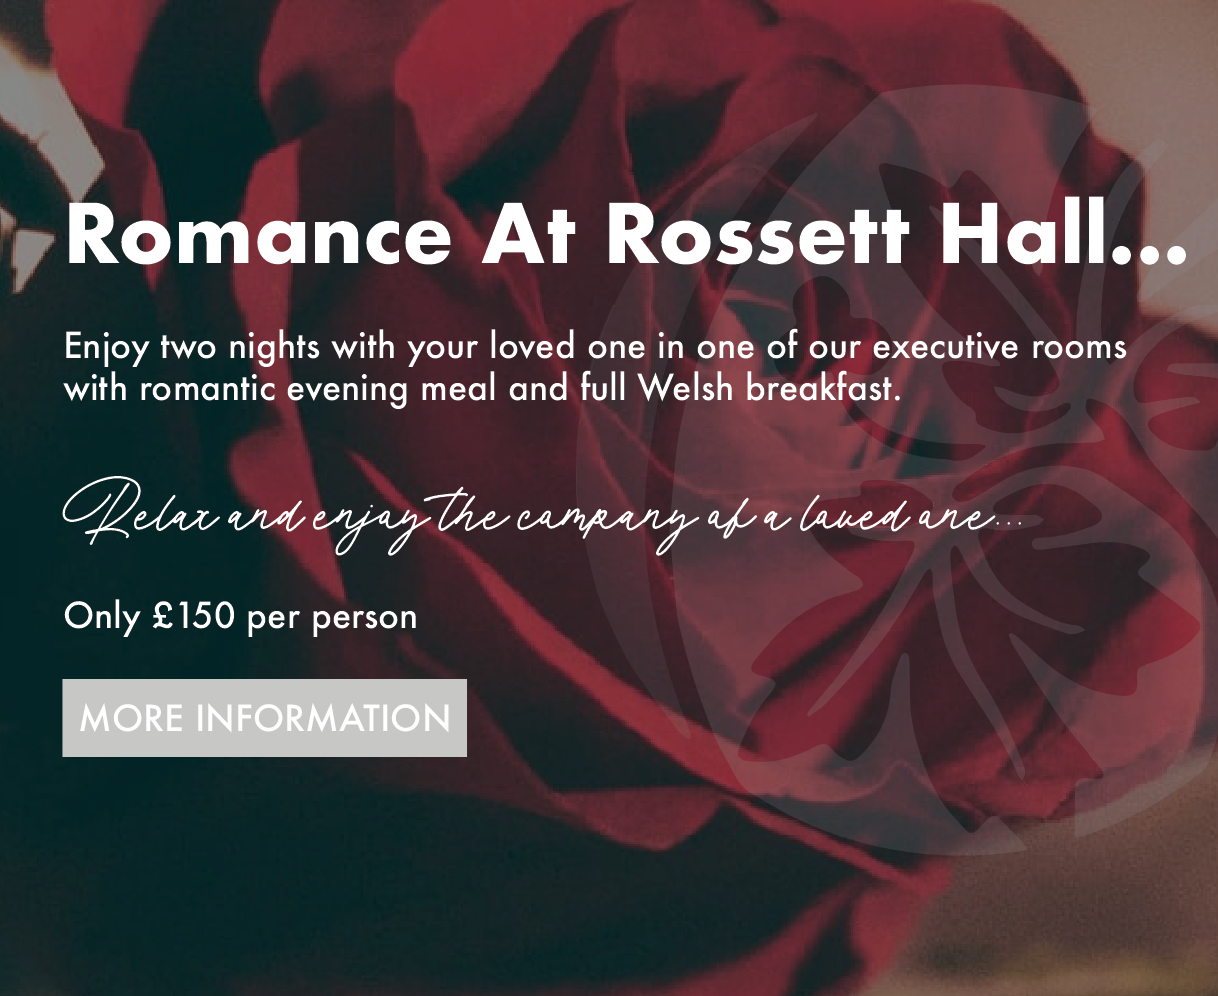 Romance at Rossett Hall.png